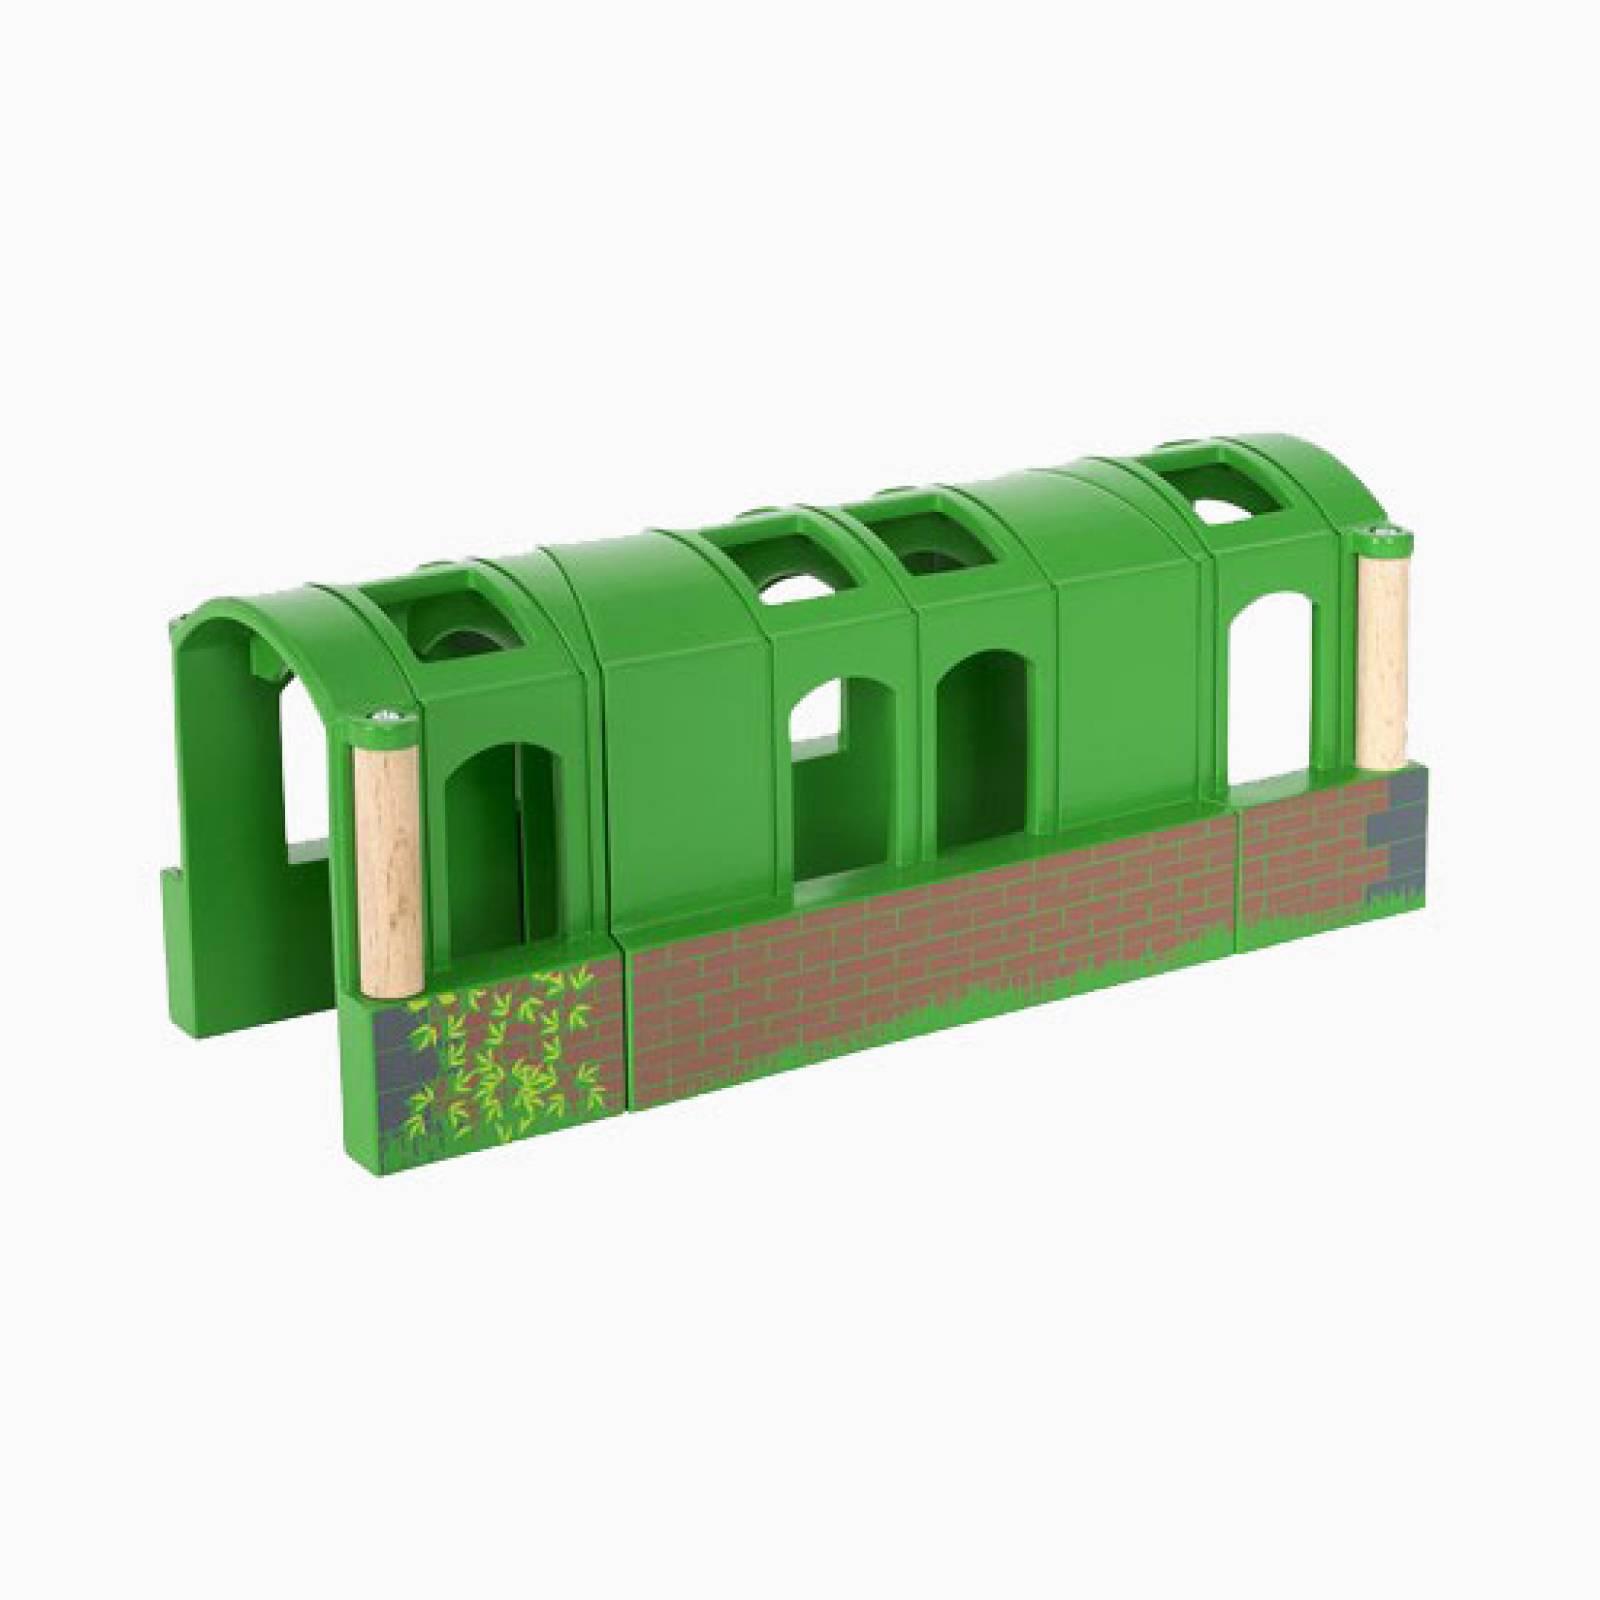 Flexible Tunnel BRIO Wooden Railway Age 3+